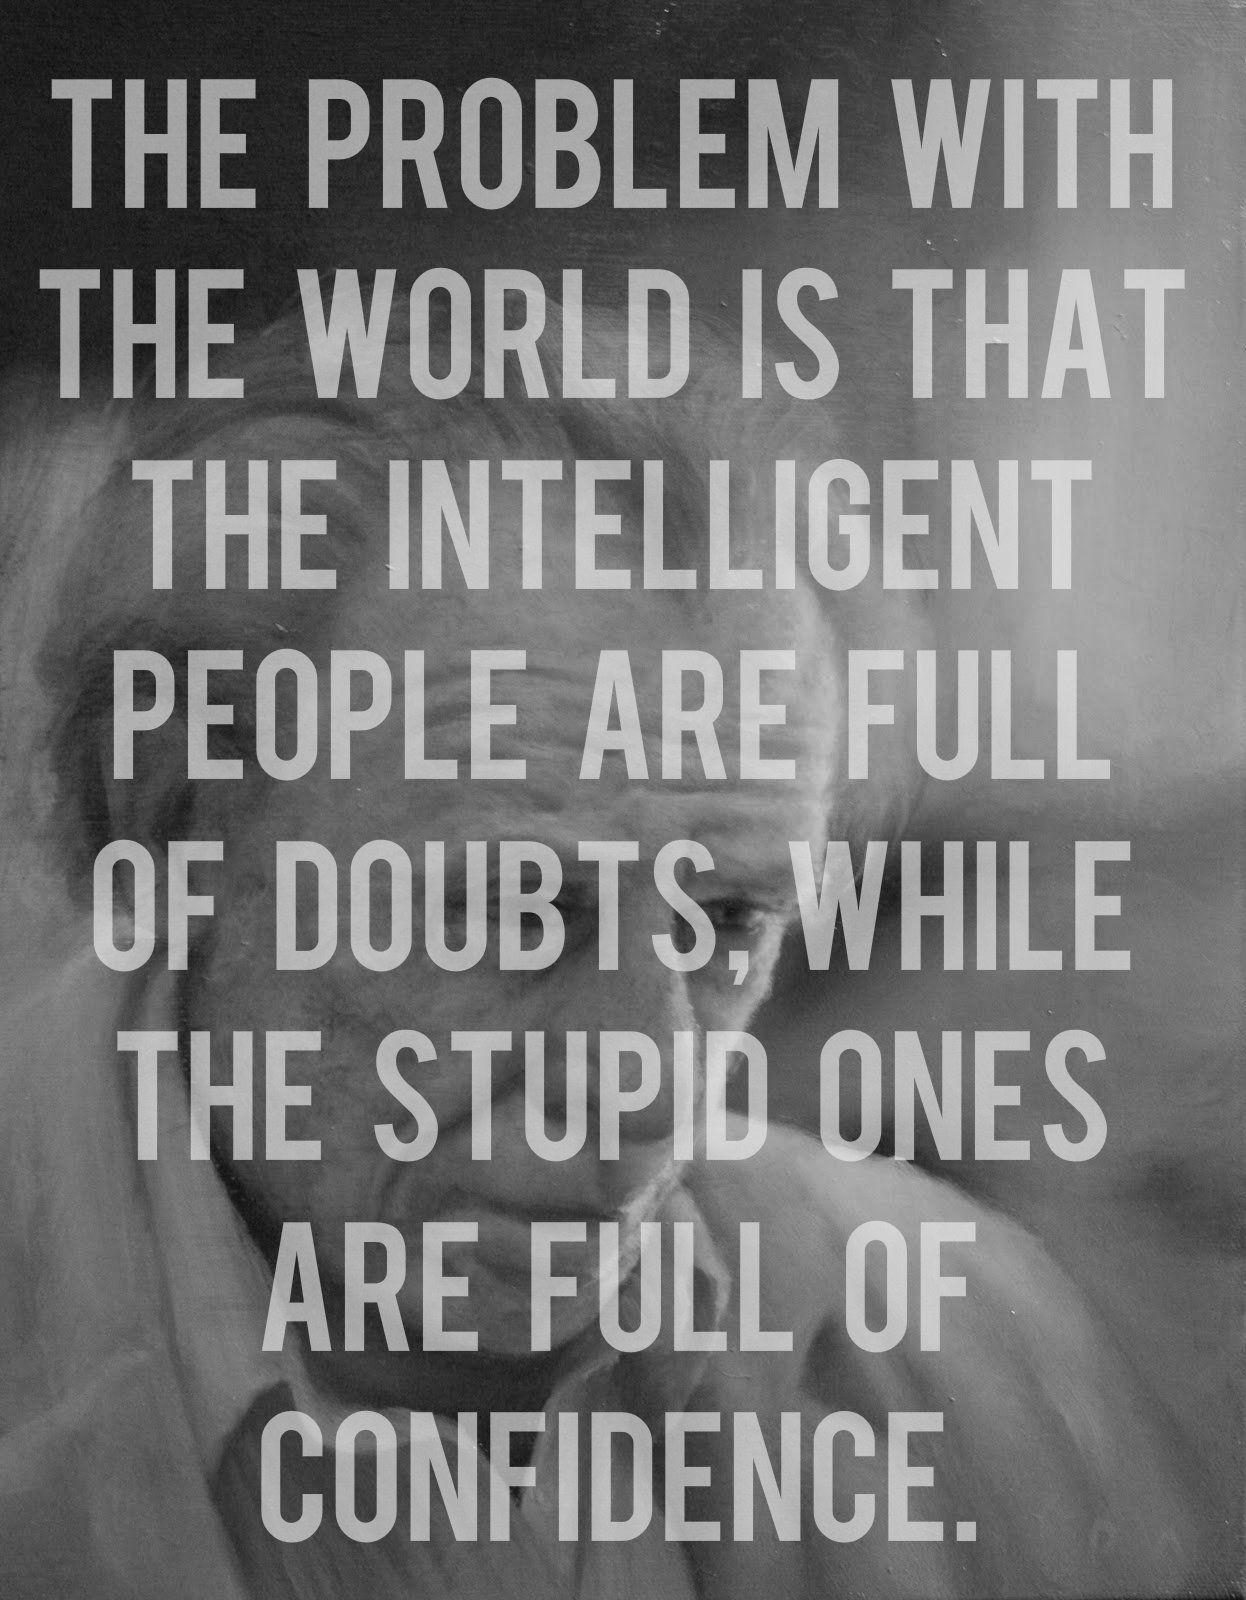 Quotes On Intelligent : quotes, intelligent, Quotes, About, Being, Intelligent, Quotes), Intelligence, Quotes,, Words, Quotable